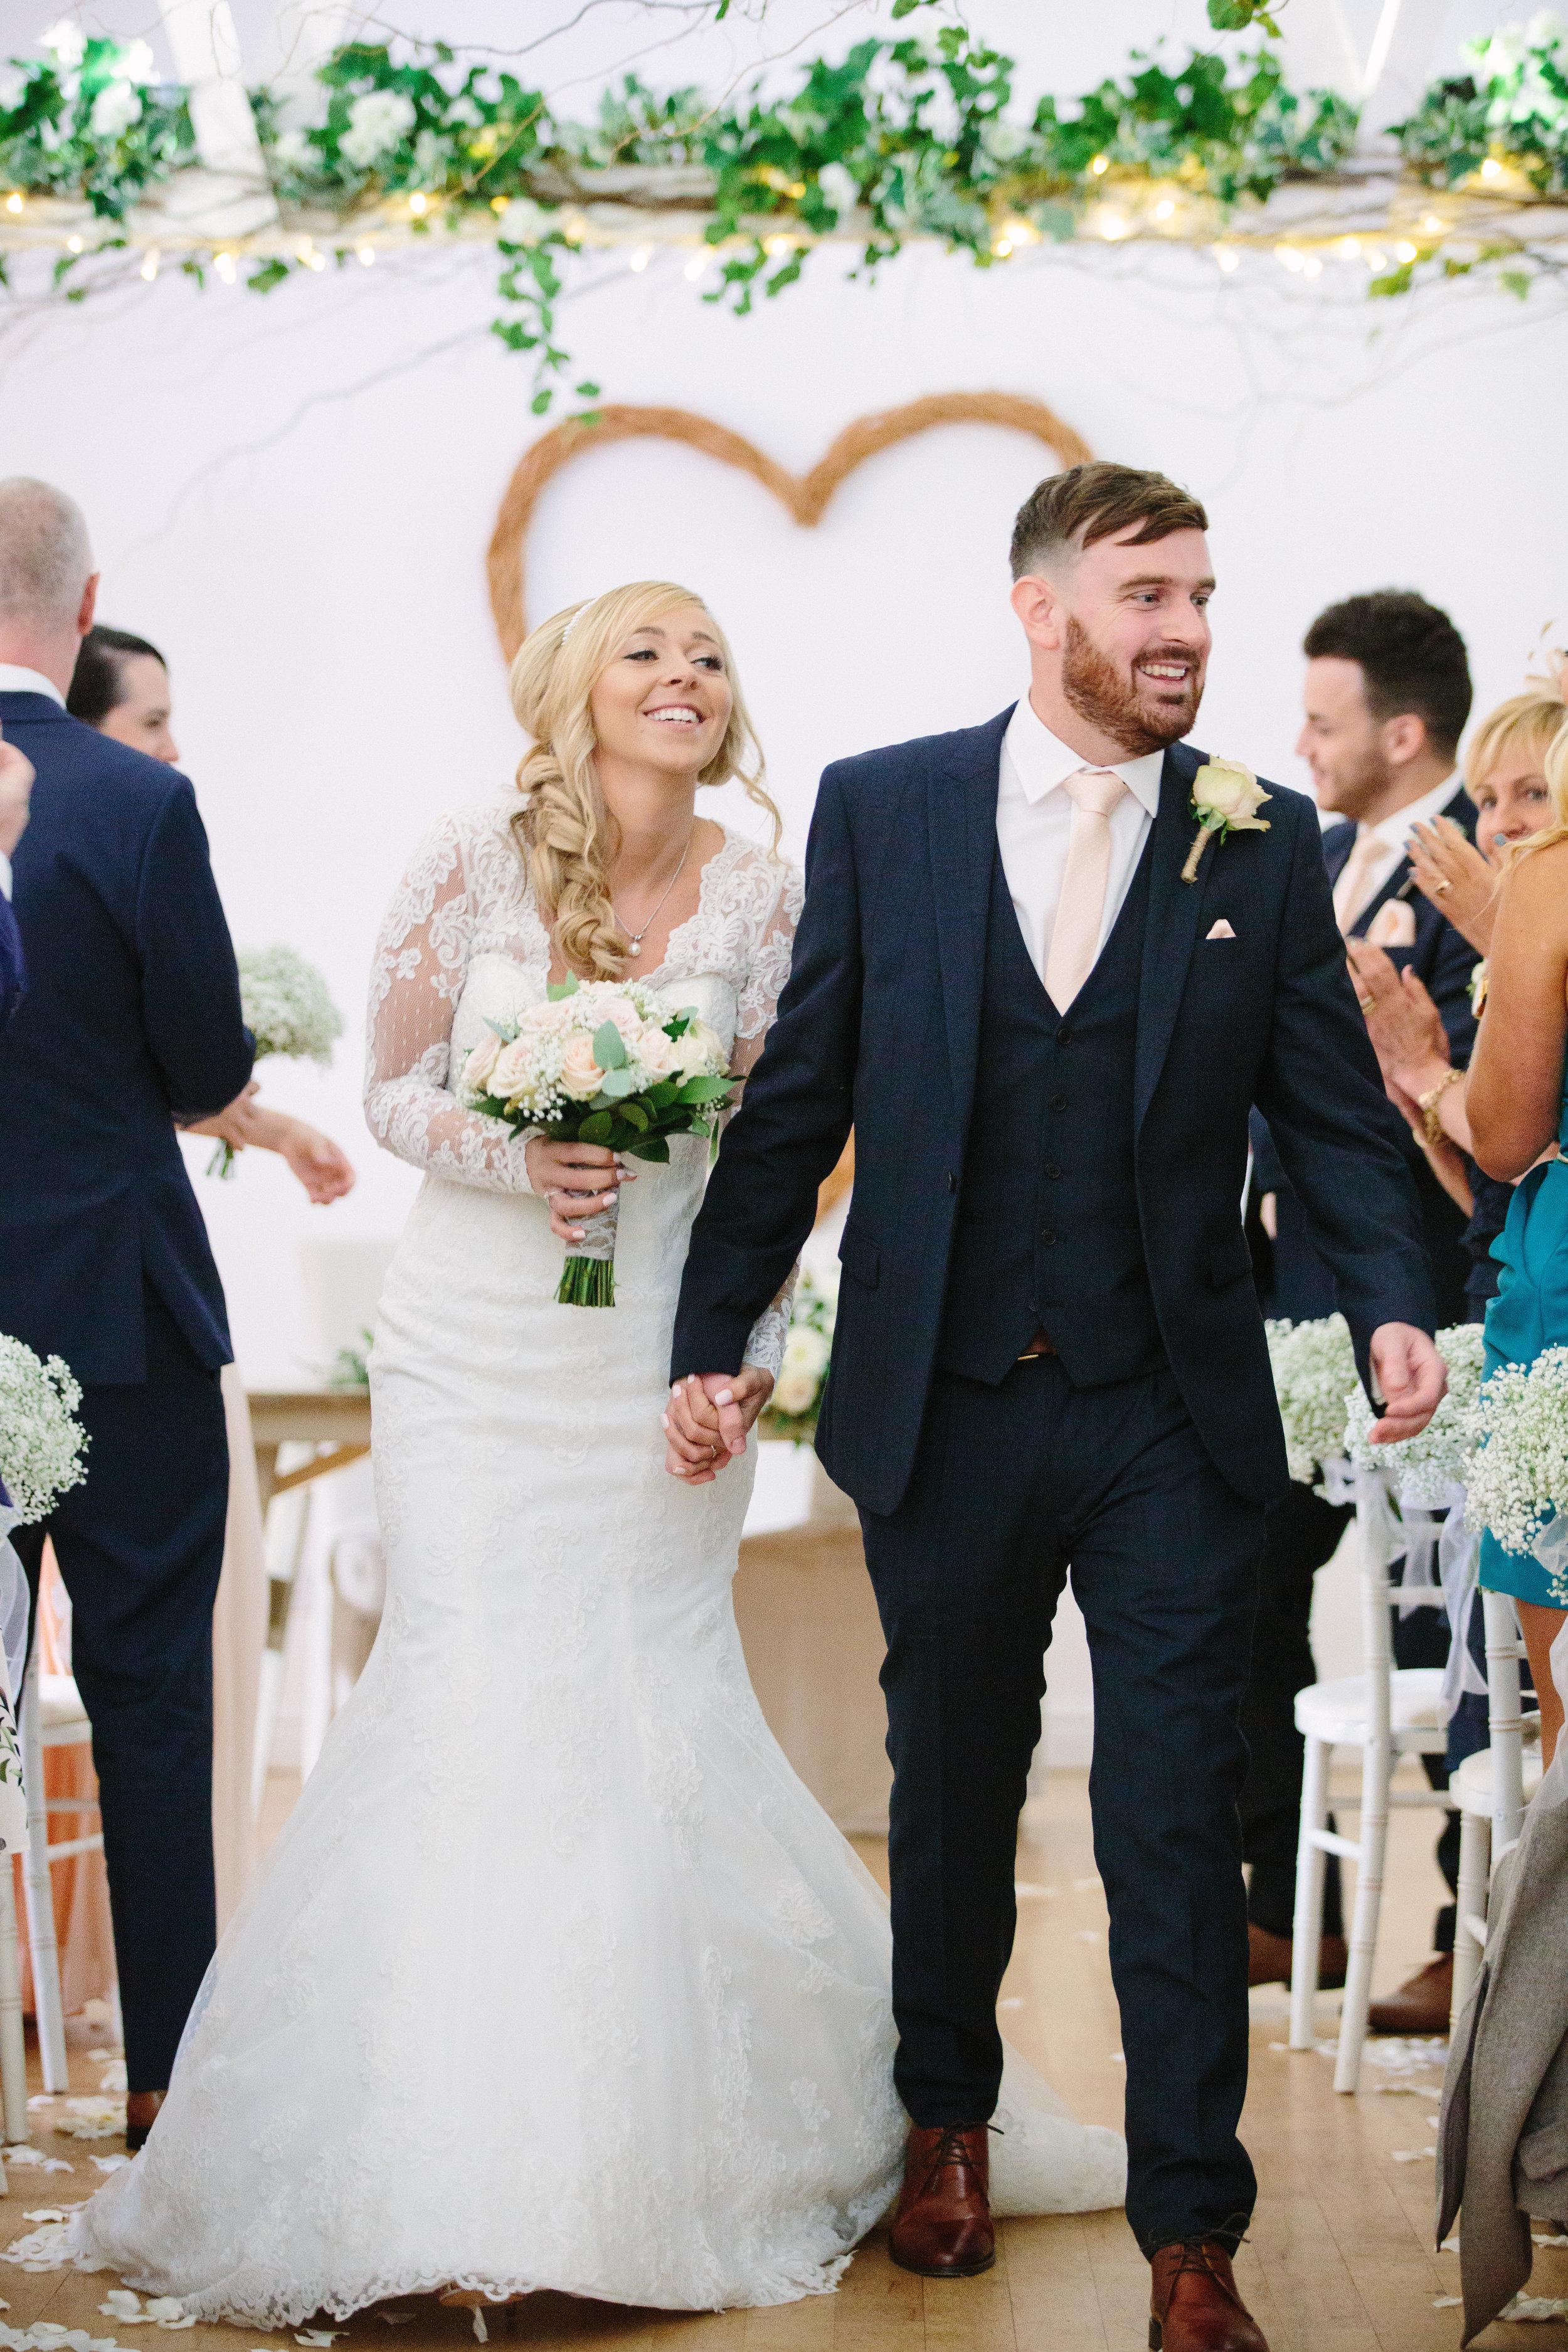 london-hertfordshire-wedding-photography-milling-barn-ceremony-49